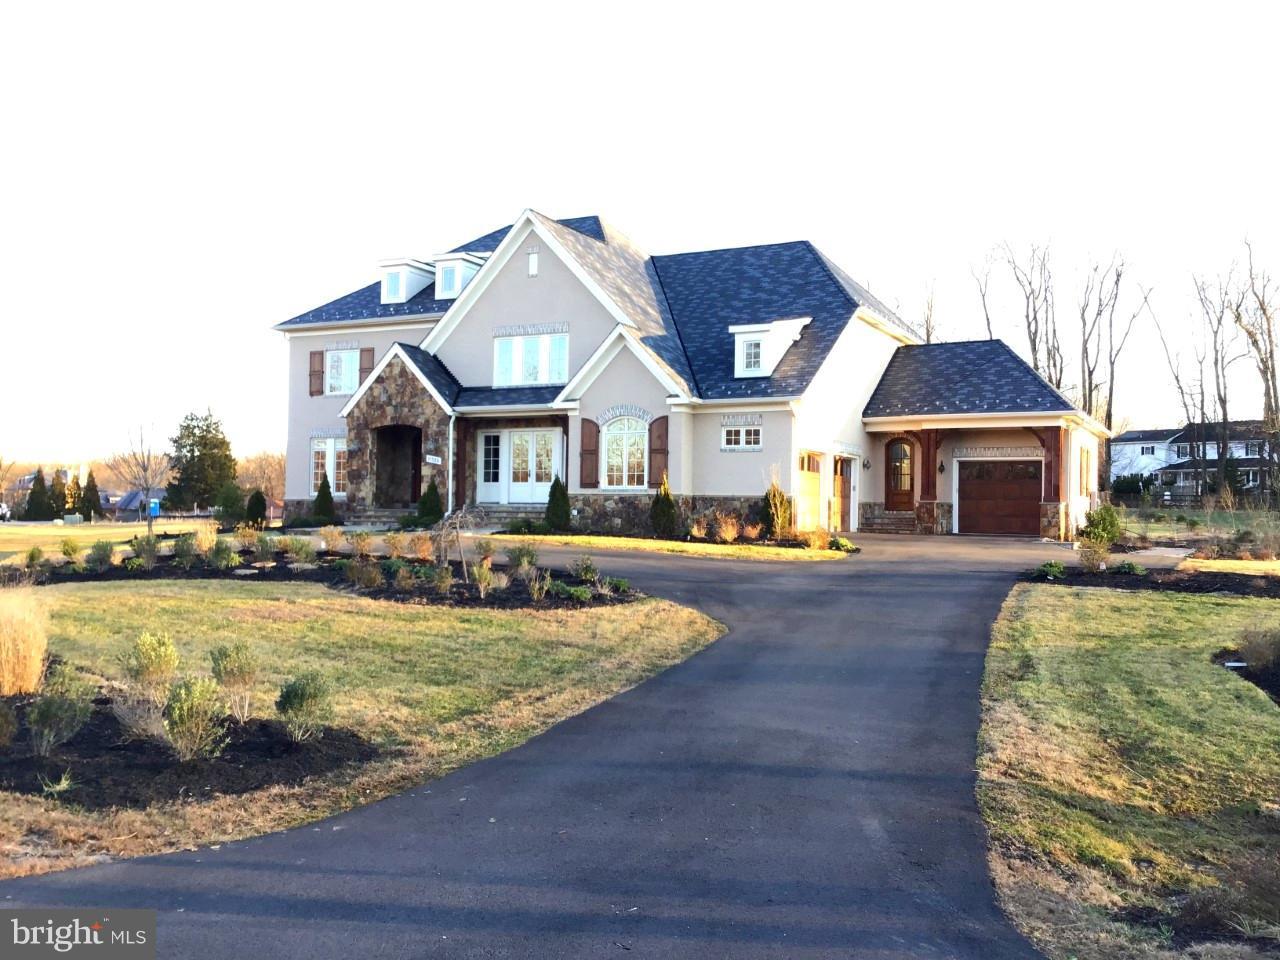 11325 Fox Creek Farm Way, Great Falls, VA, 22066